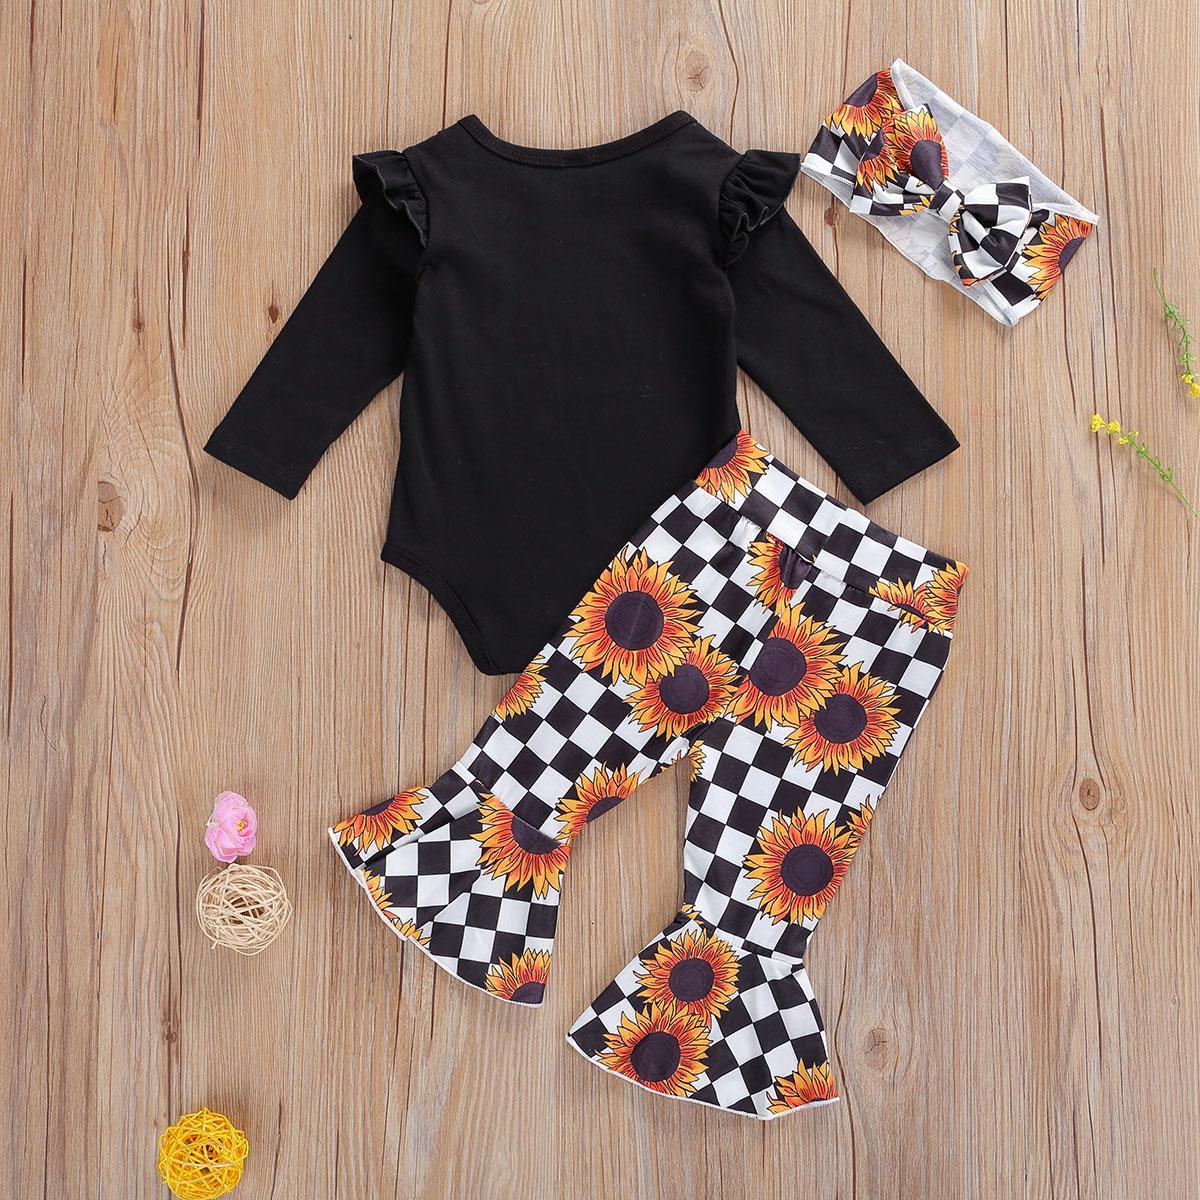 Baby Girls Clothes Set Newborn Infant 0-4Y Fashion 3PCS Print Top Romper+Flare Pants+Headband Bebes Set Vetement Bebe Robe Bebe